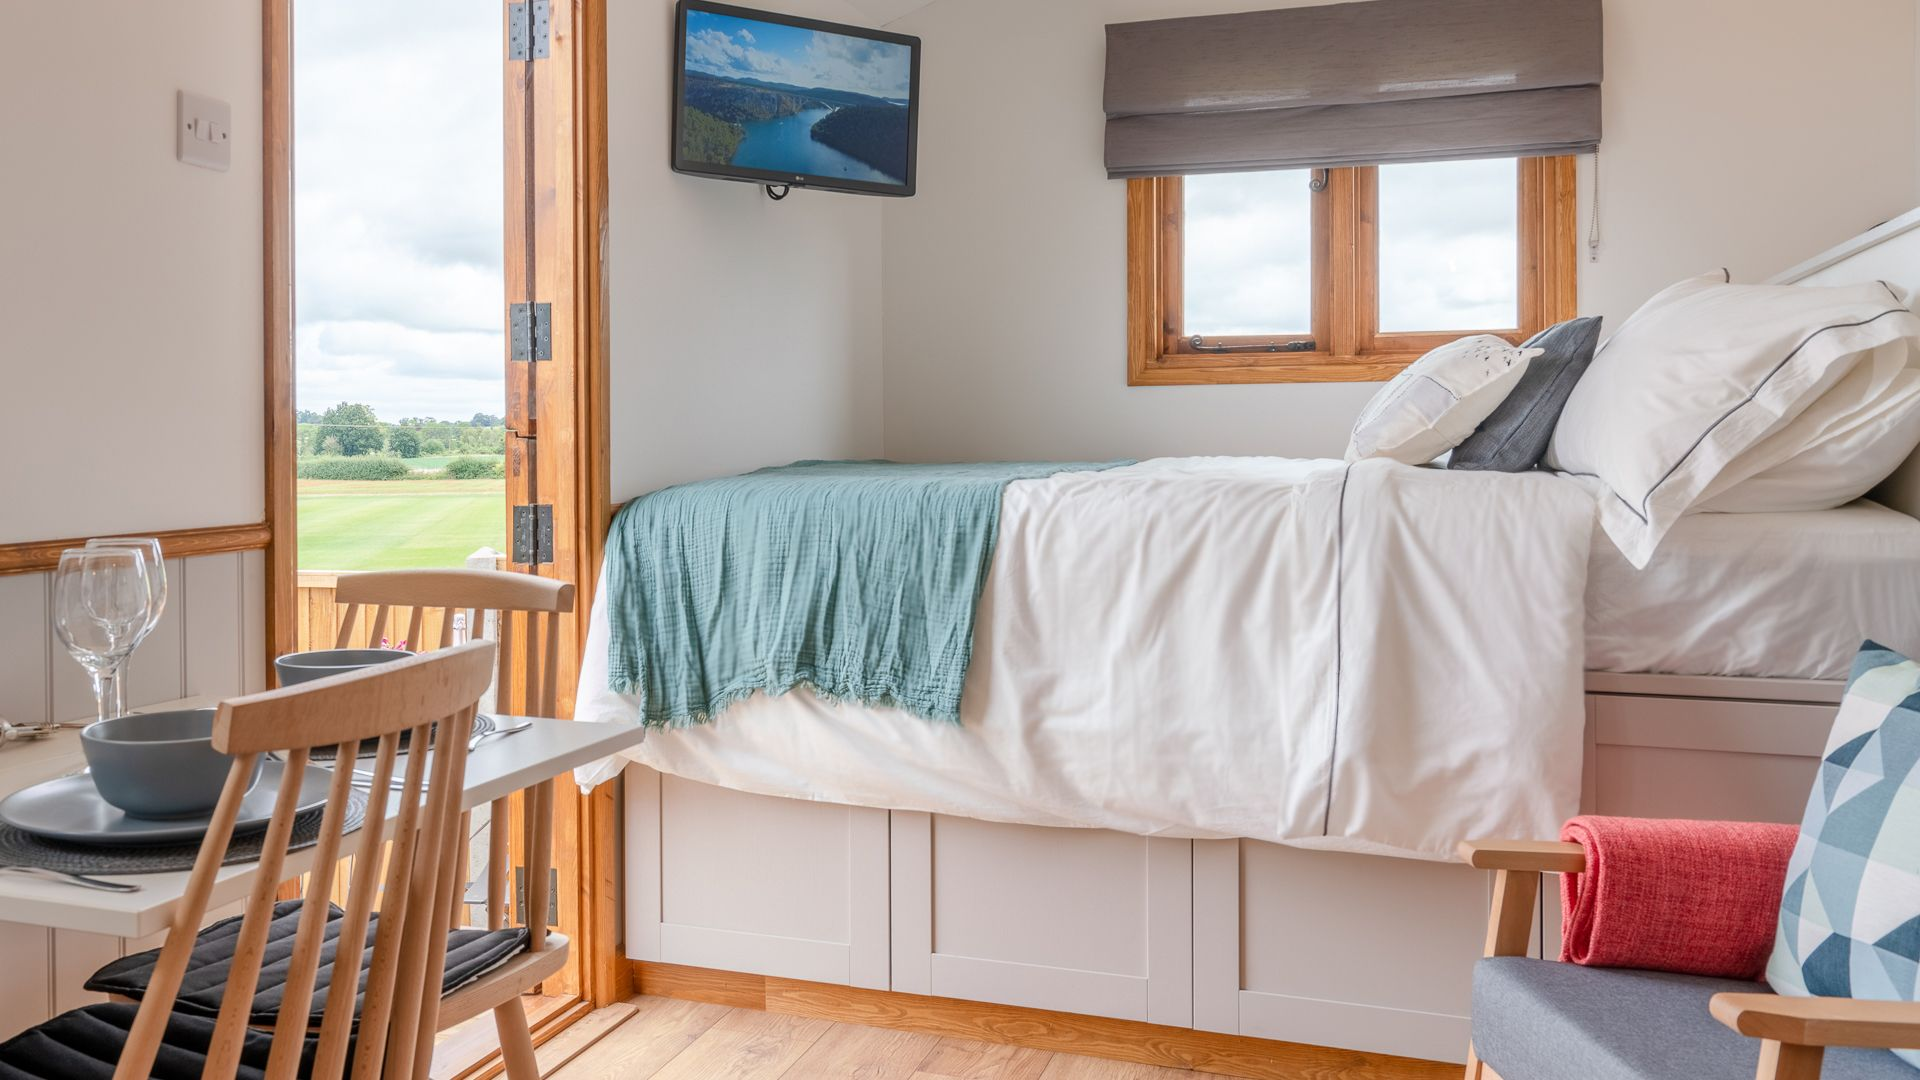 Sleeping Area, Outbak Shepherds Hut, Bolthole Retreats